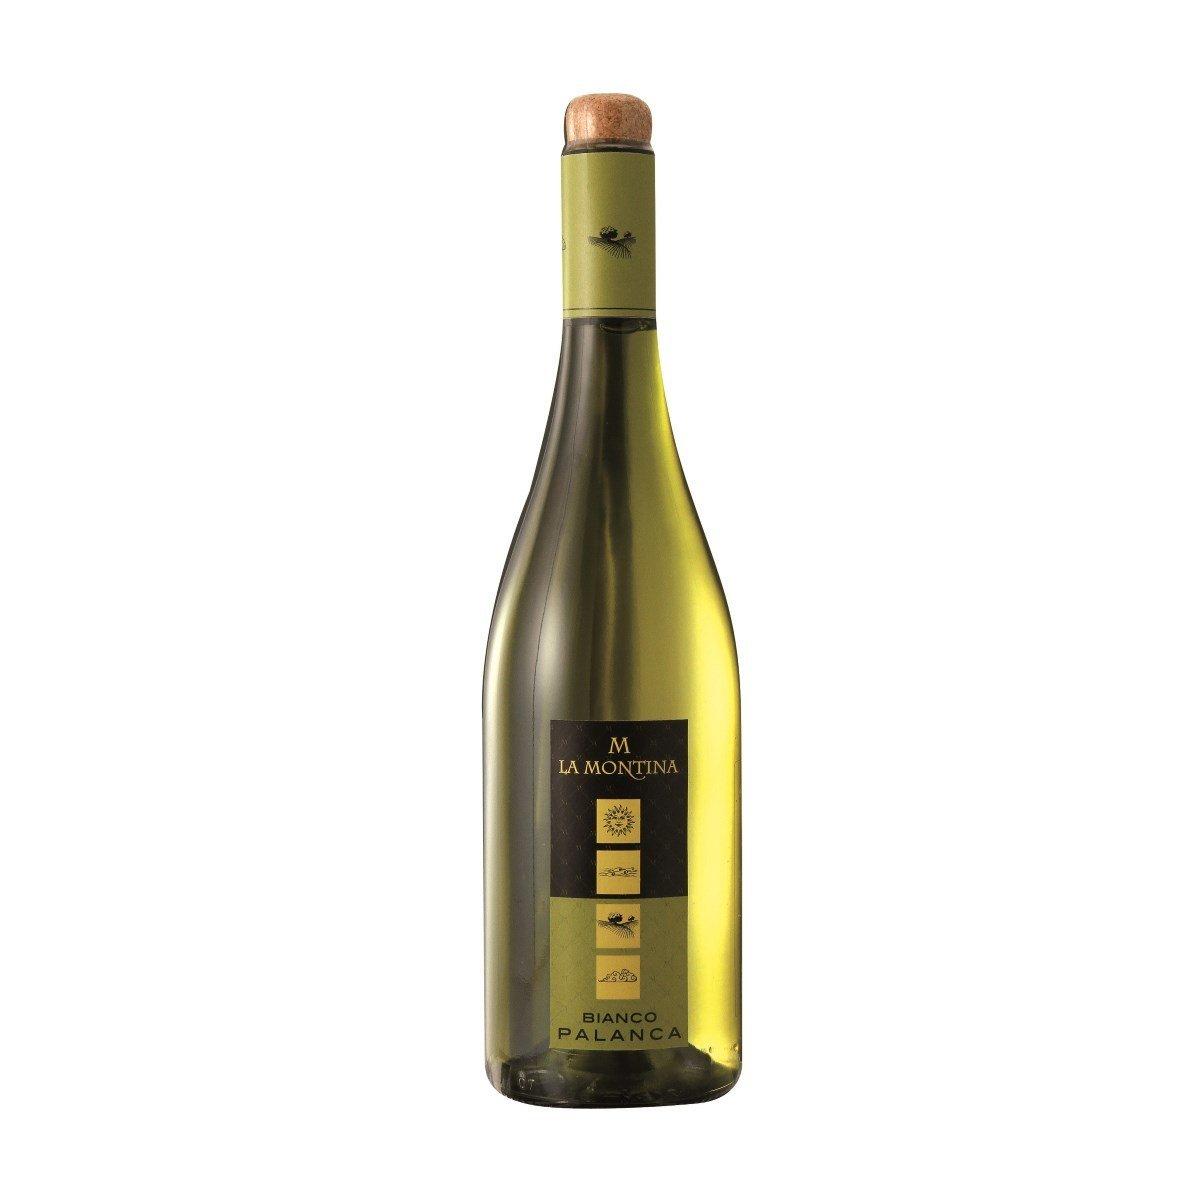 Bianco Palanca (3 bottiglie) 14975